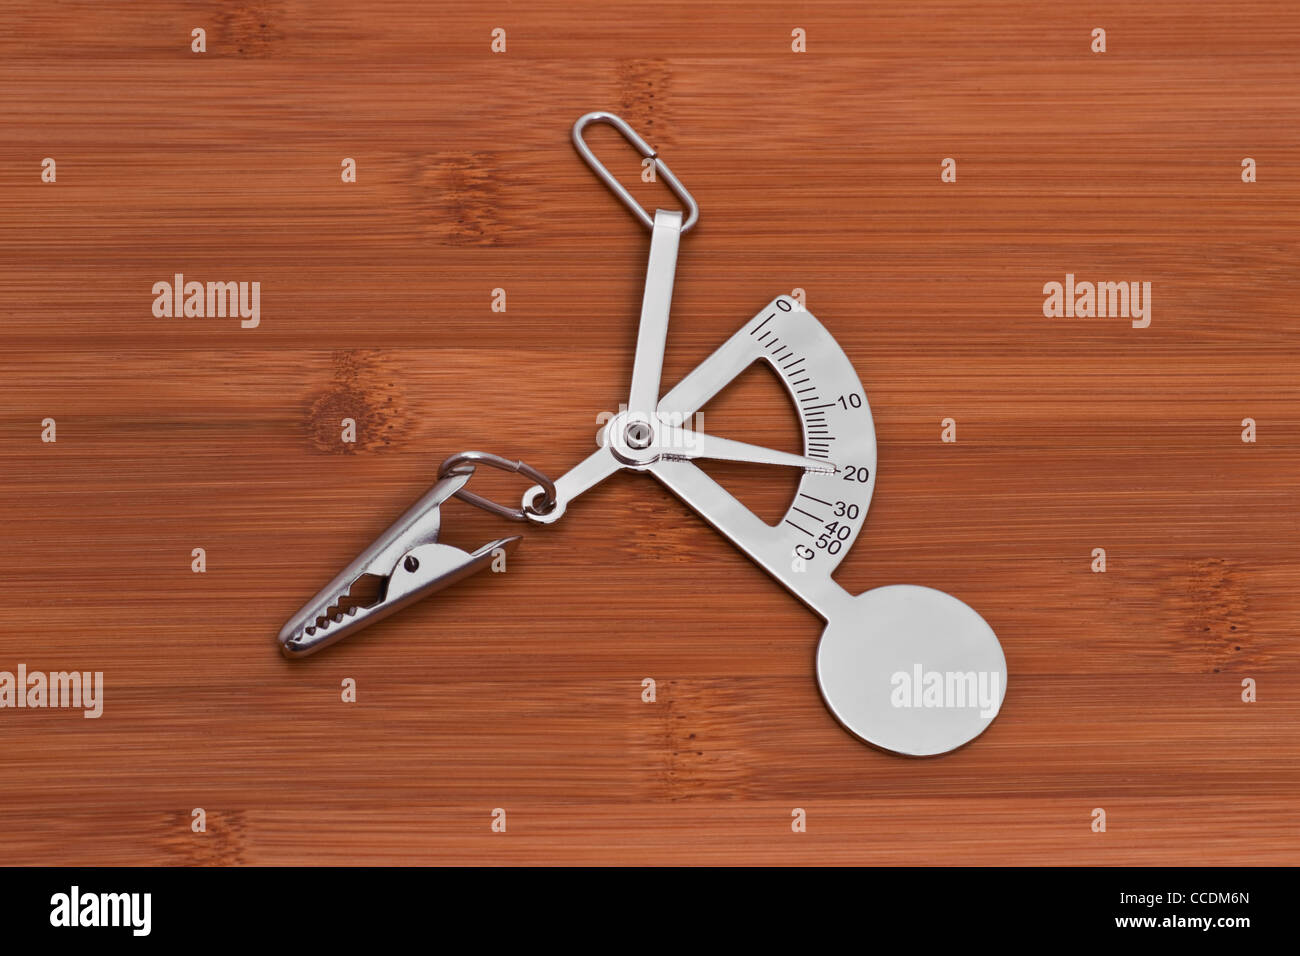 Detailansicht einer Handbriefwaage | Detail photo of a manual letter balance Stock Photo